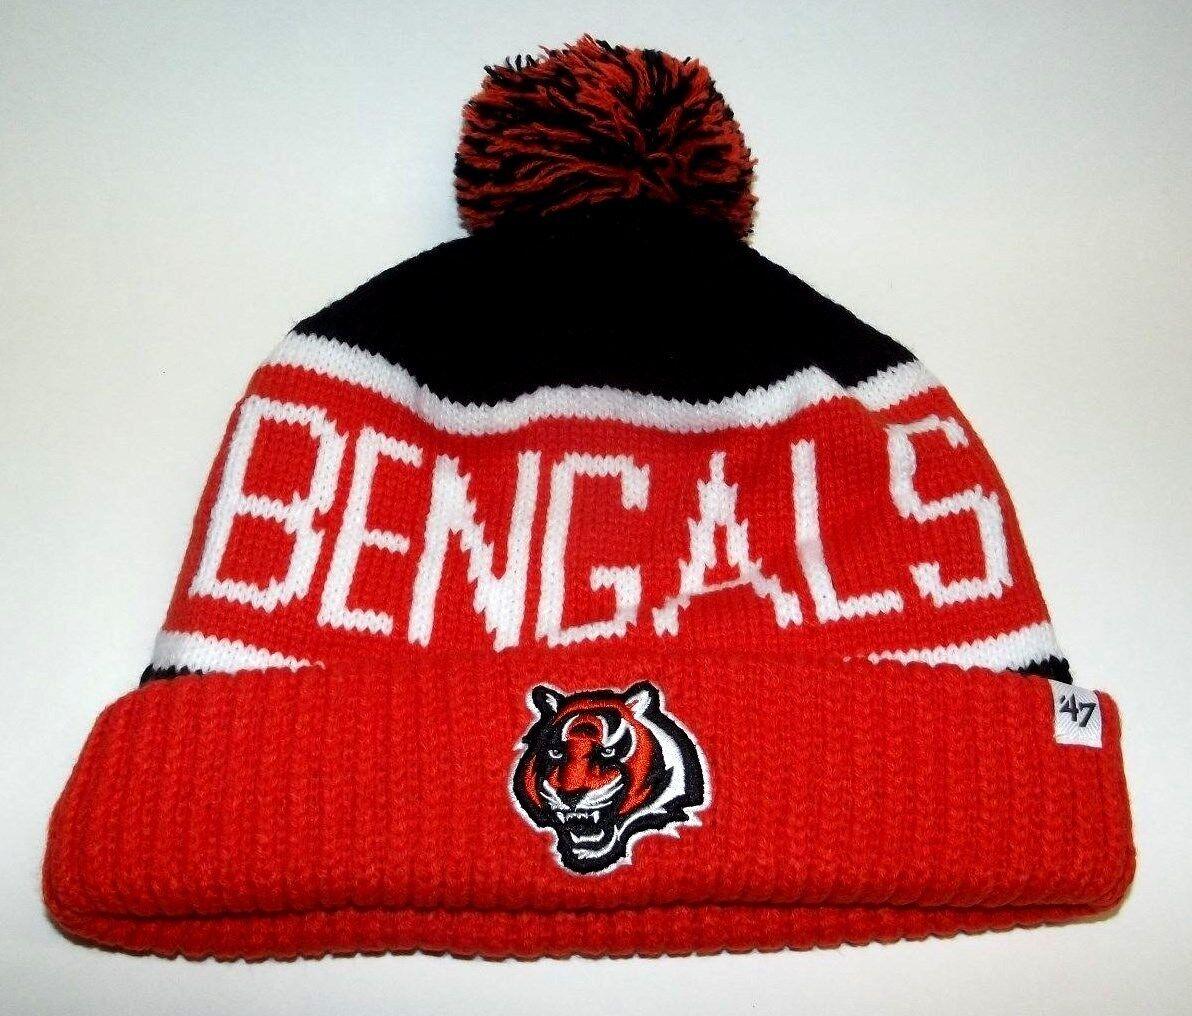 NEW47 Brand NFL Cincinnati Bengals Knit Cuffed POM Calgary Calgary Calgary Beanie Skull Cap 6caaaa